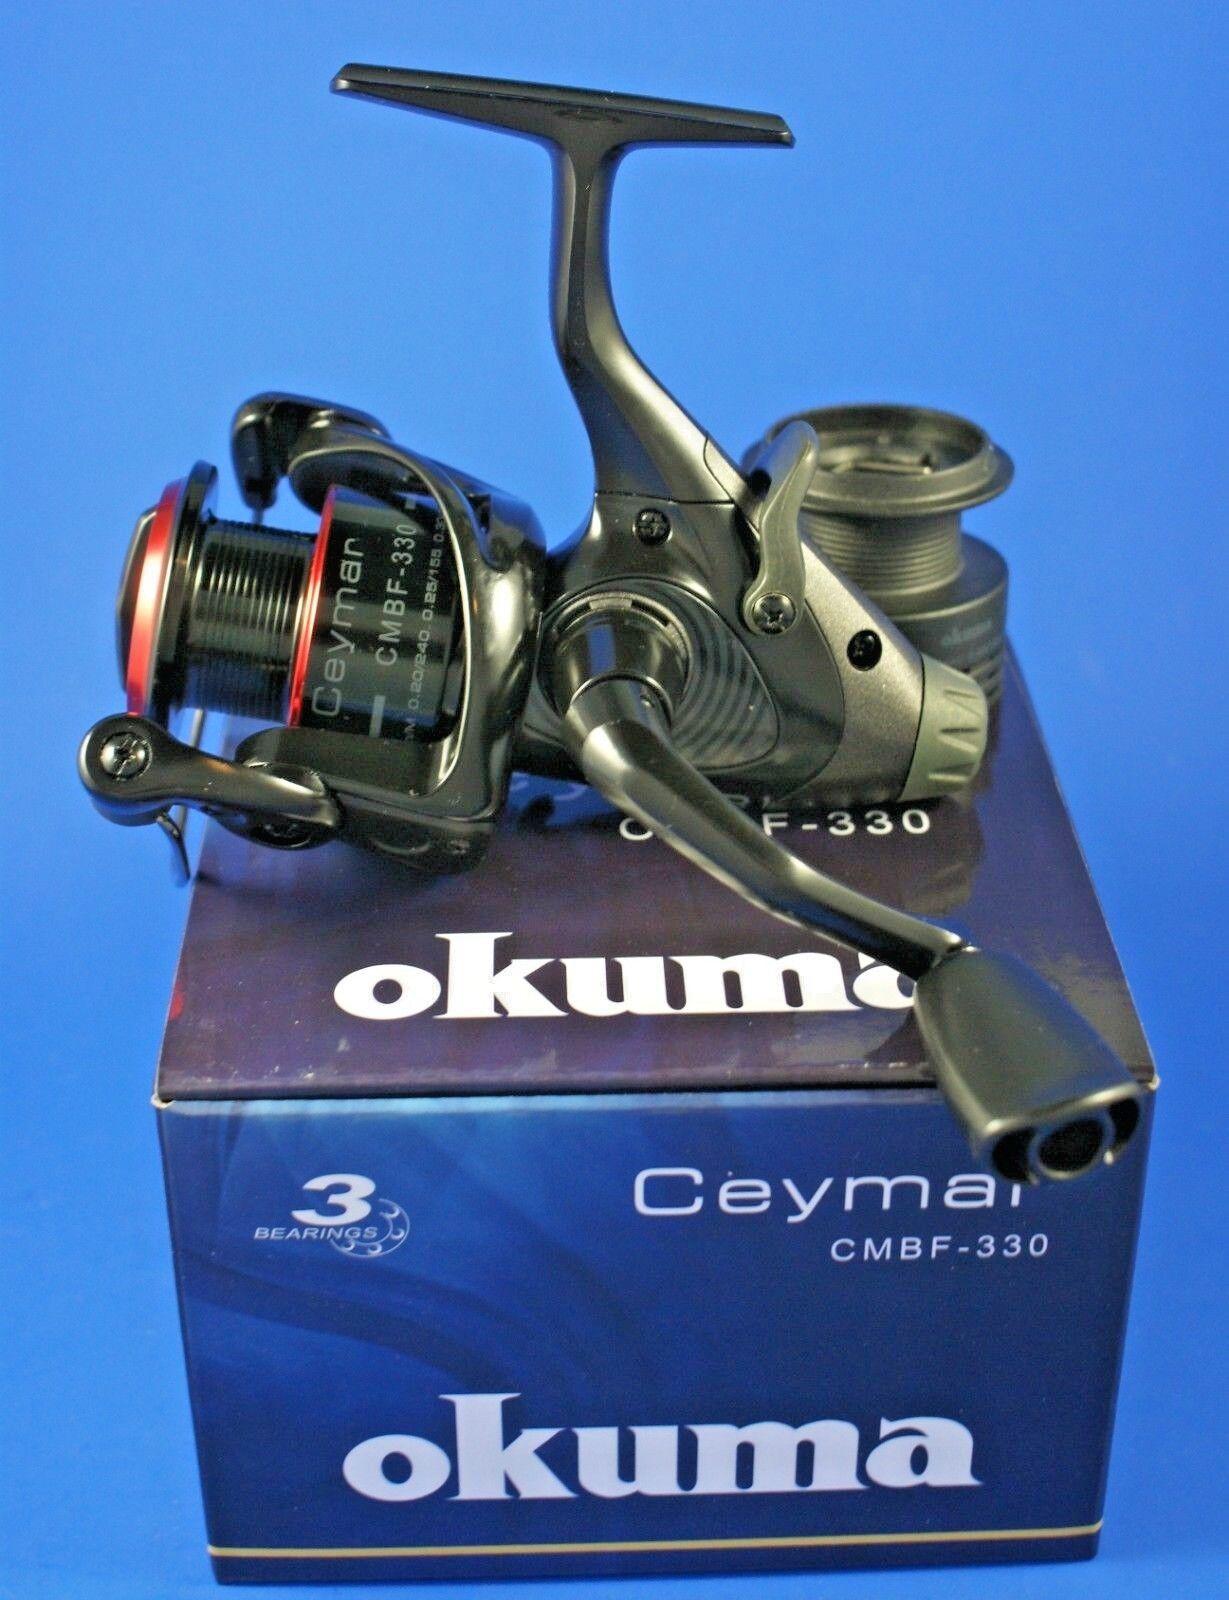 Okuma Ceymar Baitfeeder CMBF-330 2+1BB 5.0 1 54202 Fishing Reel